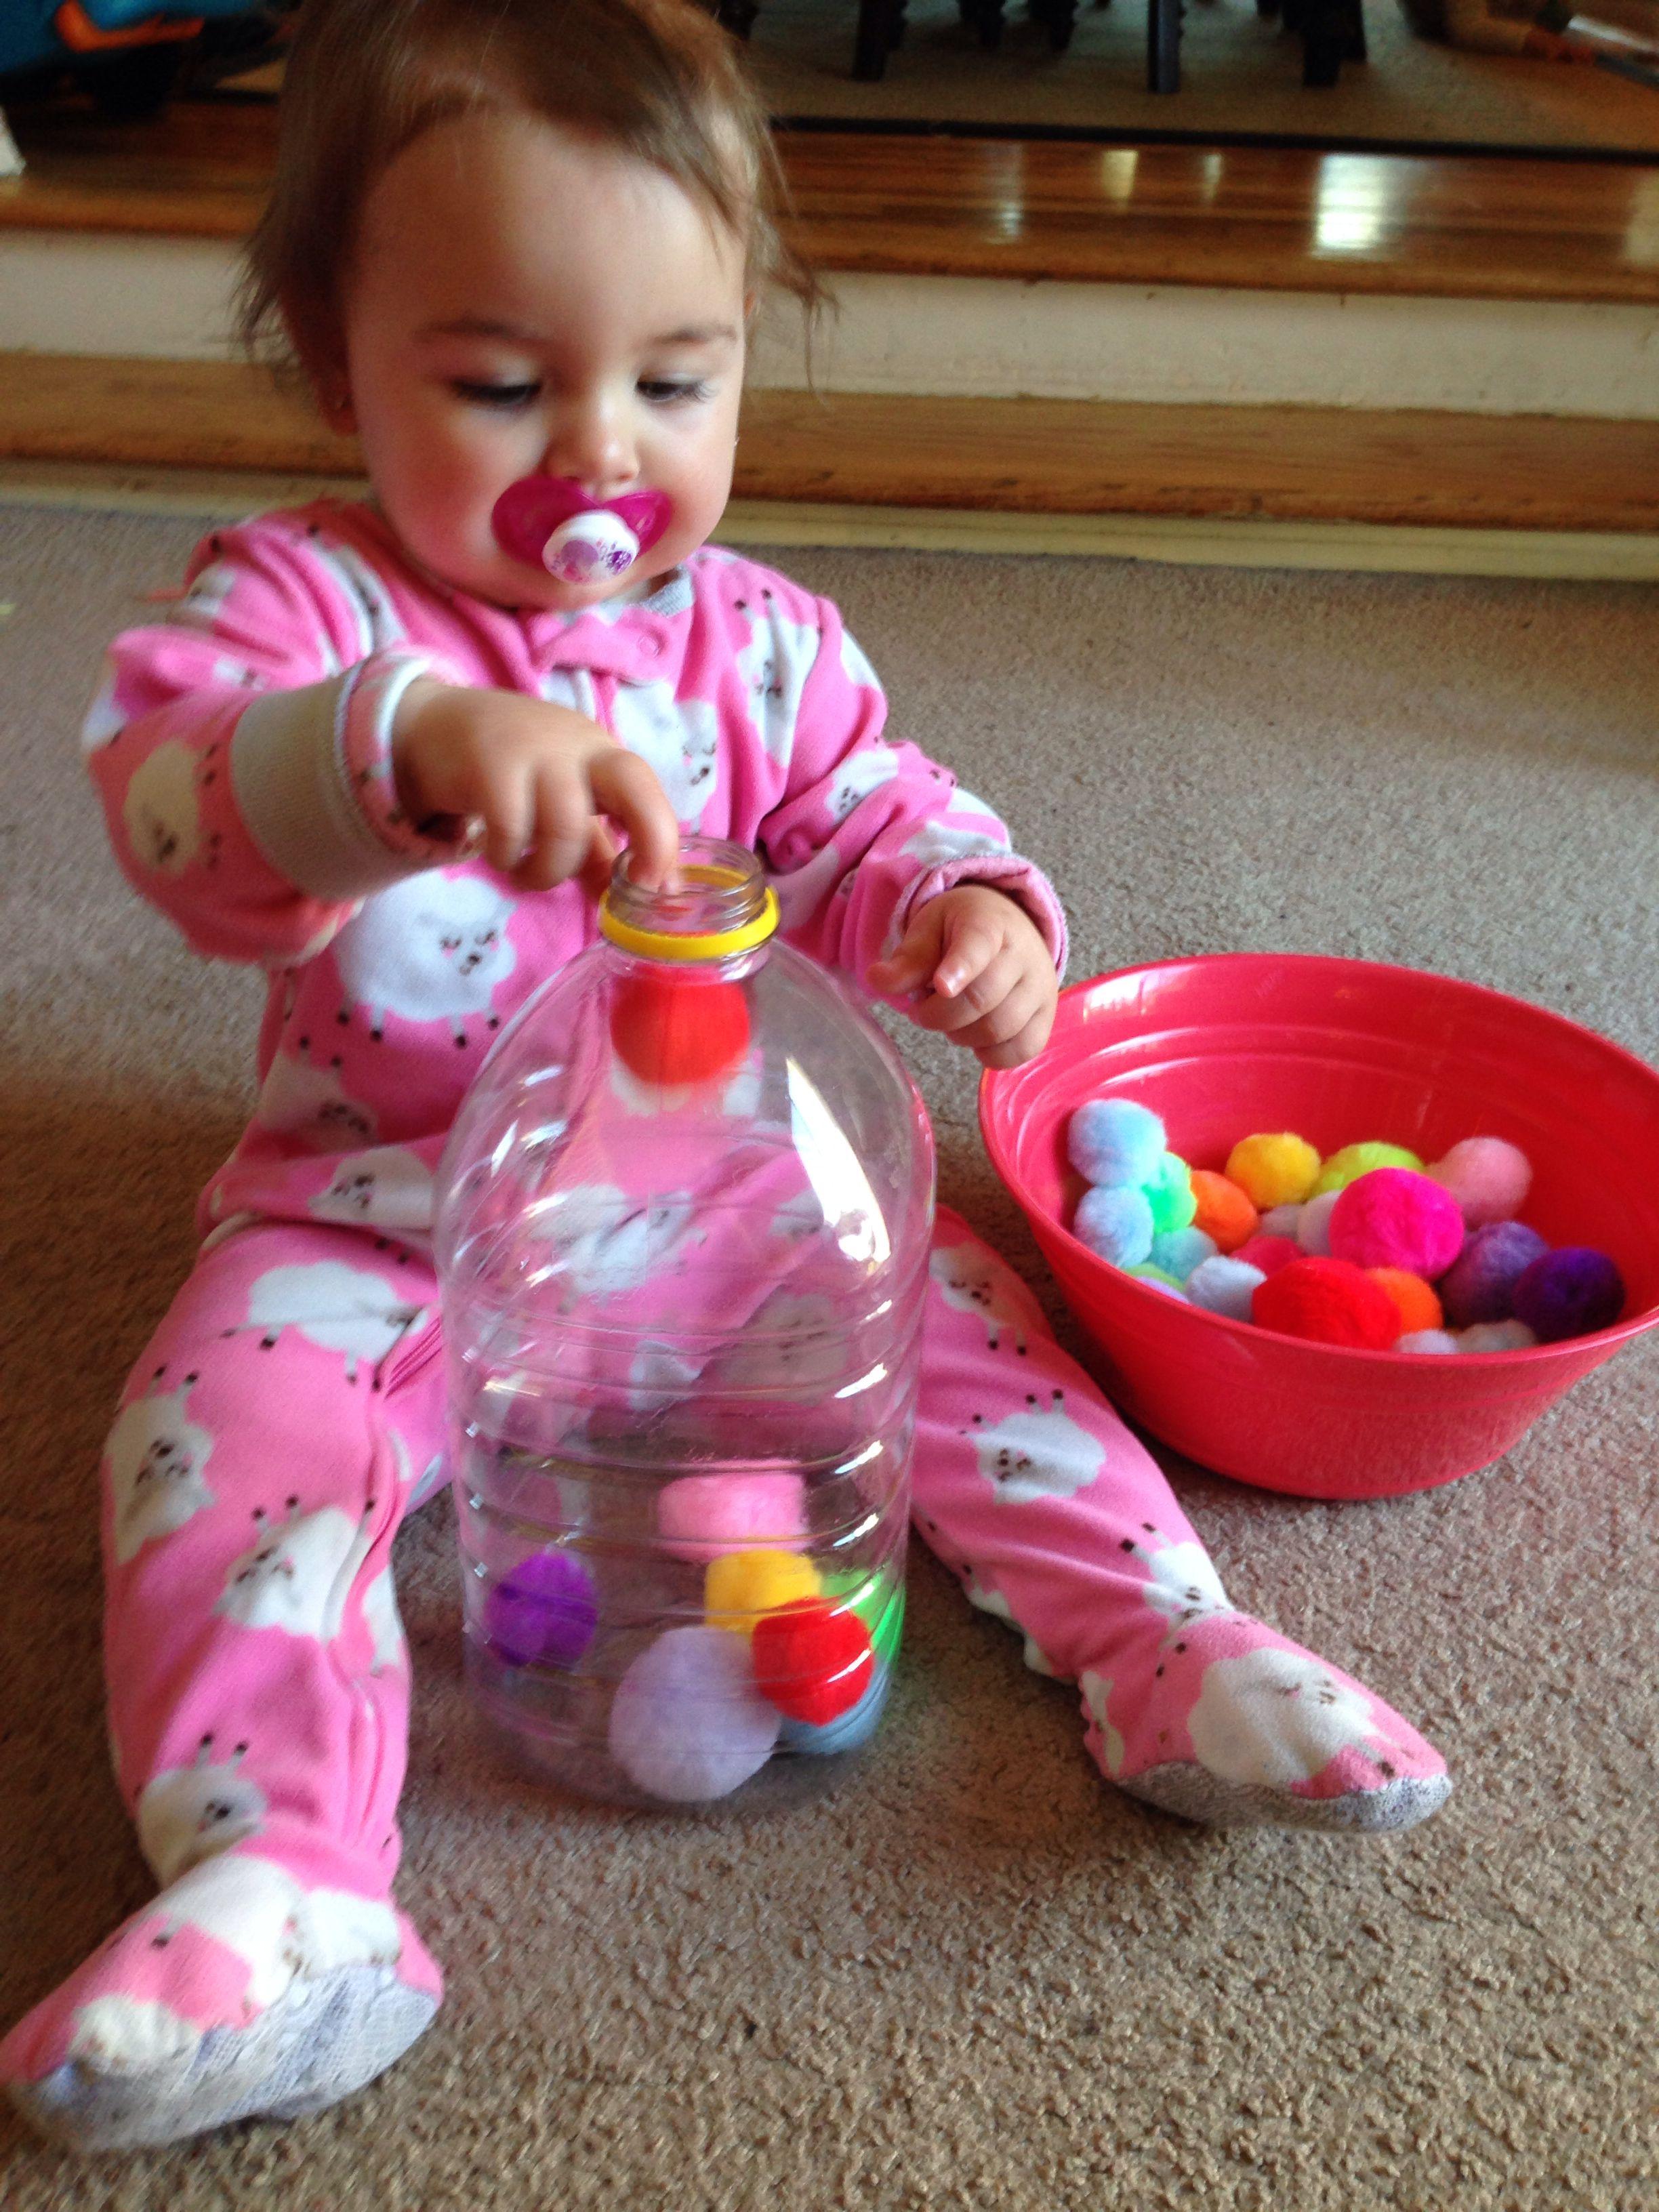 Activite Bebe 1 An Montessori : activite, montessori, Épinglé, Bebes